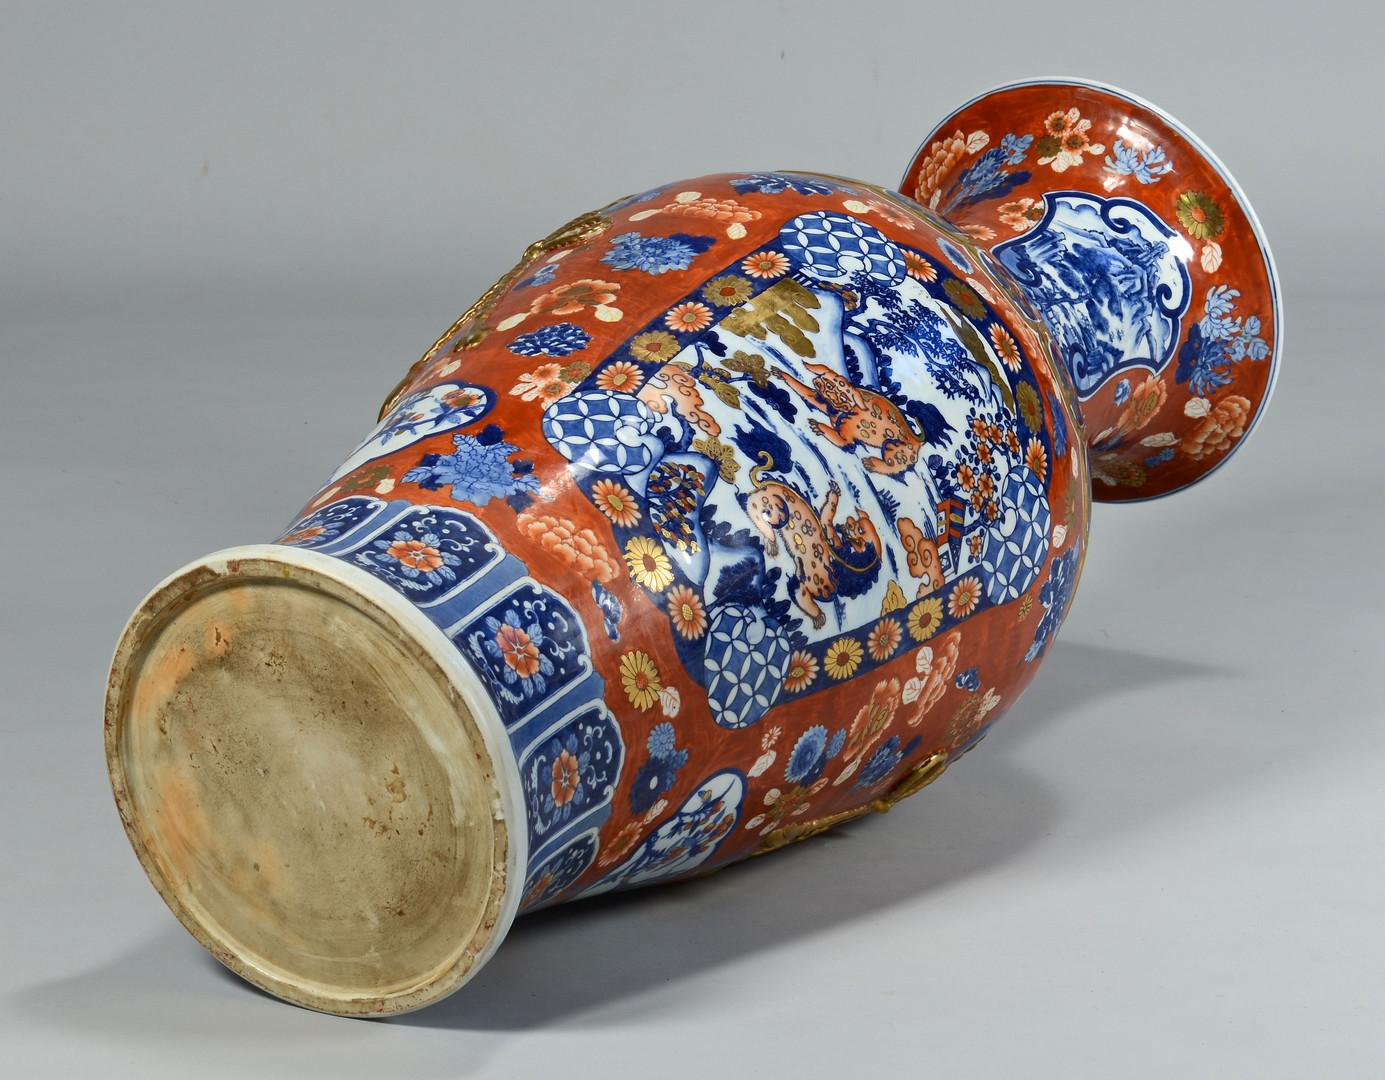 Lot 233: Monumental Japanese Imari Vase